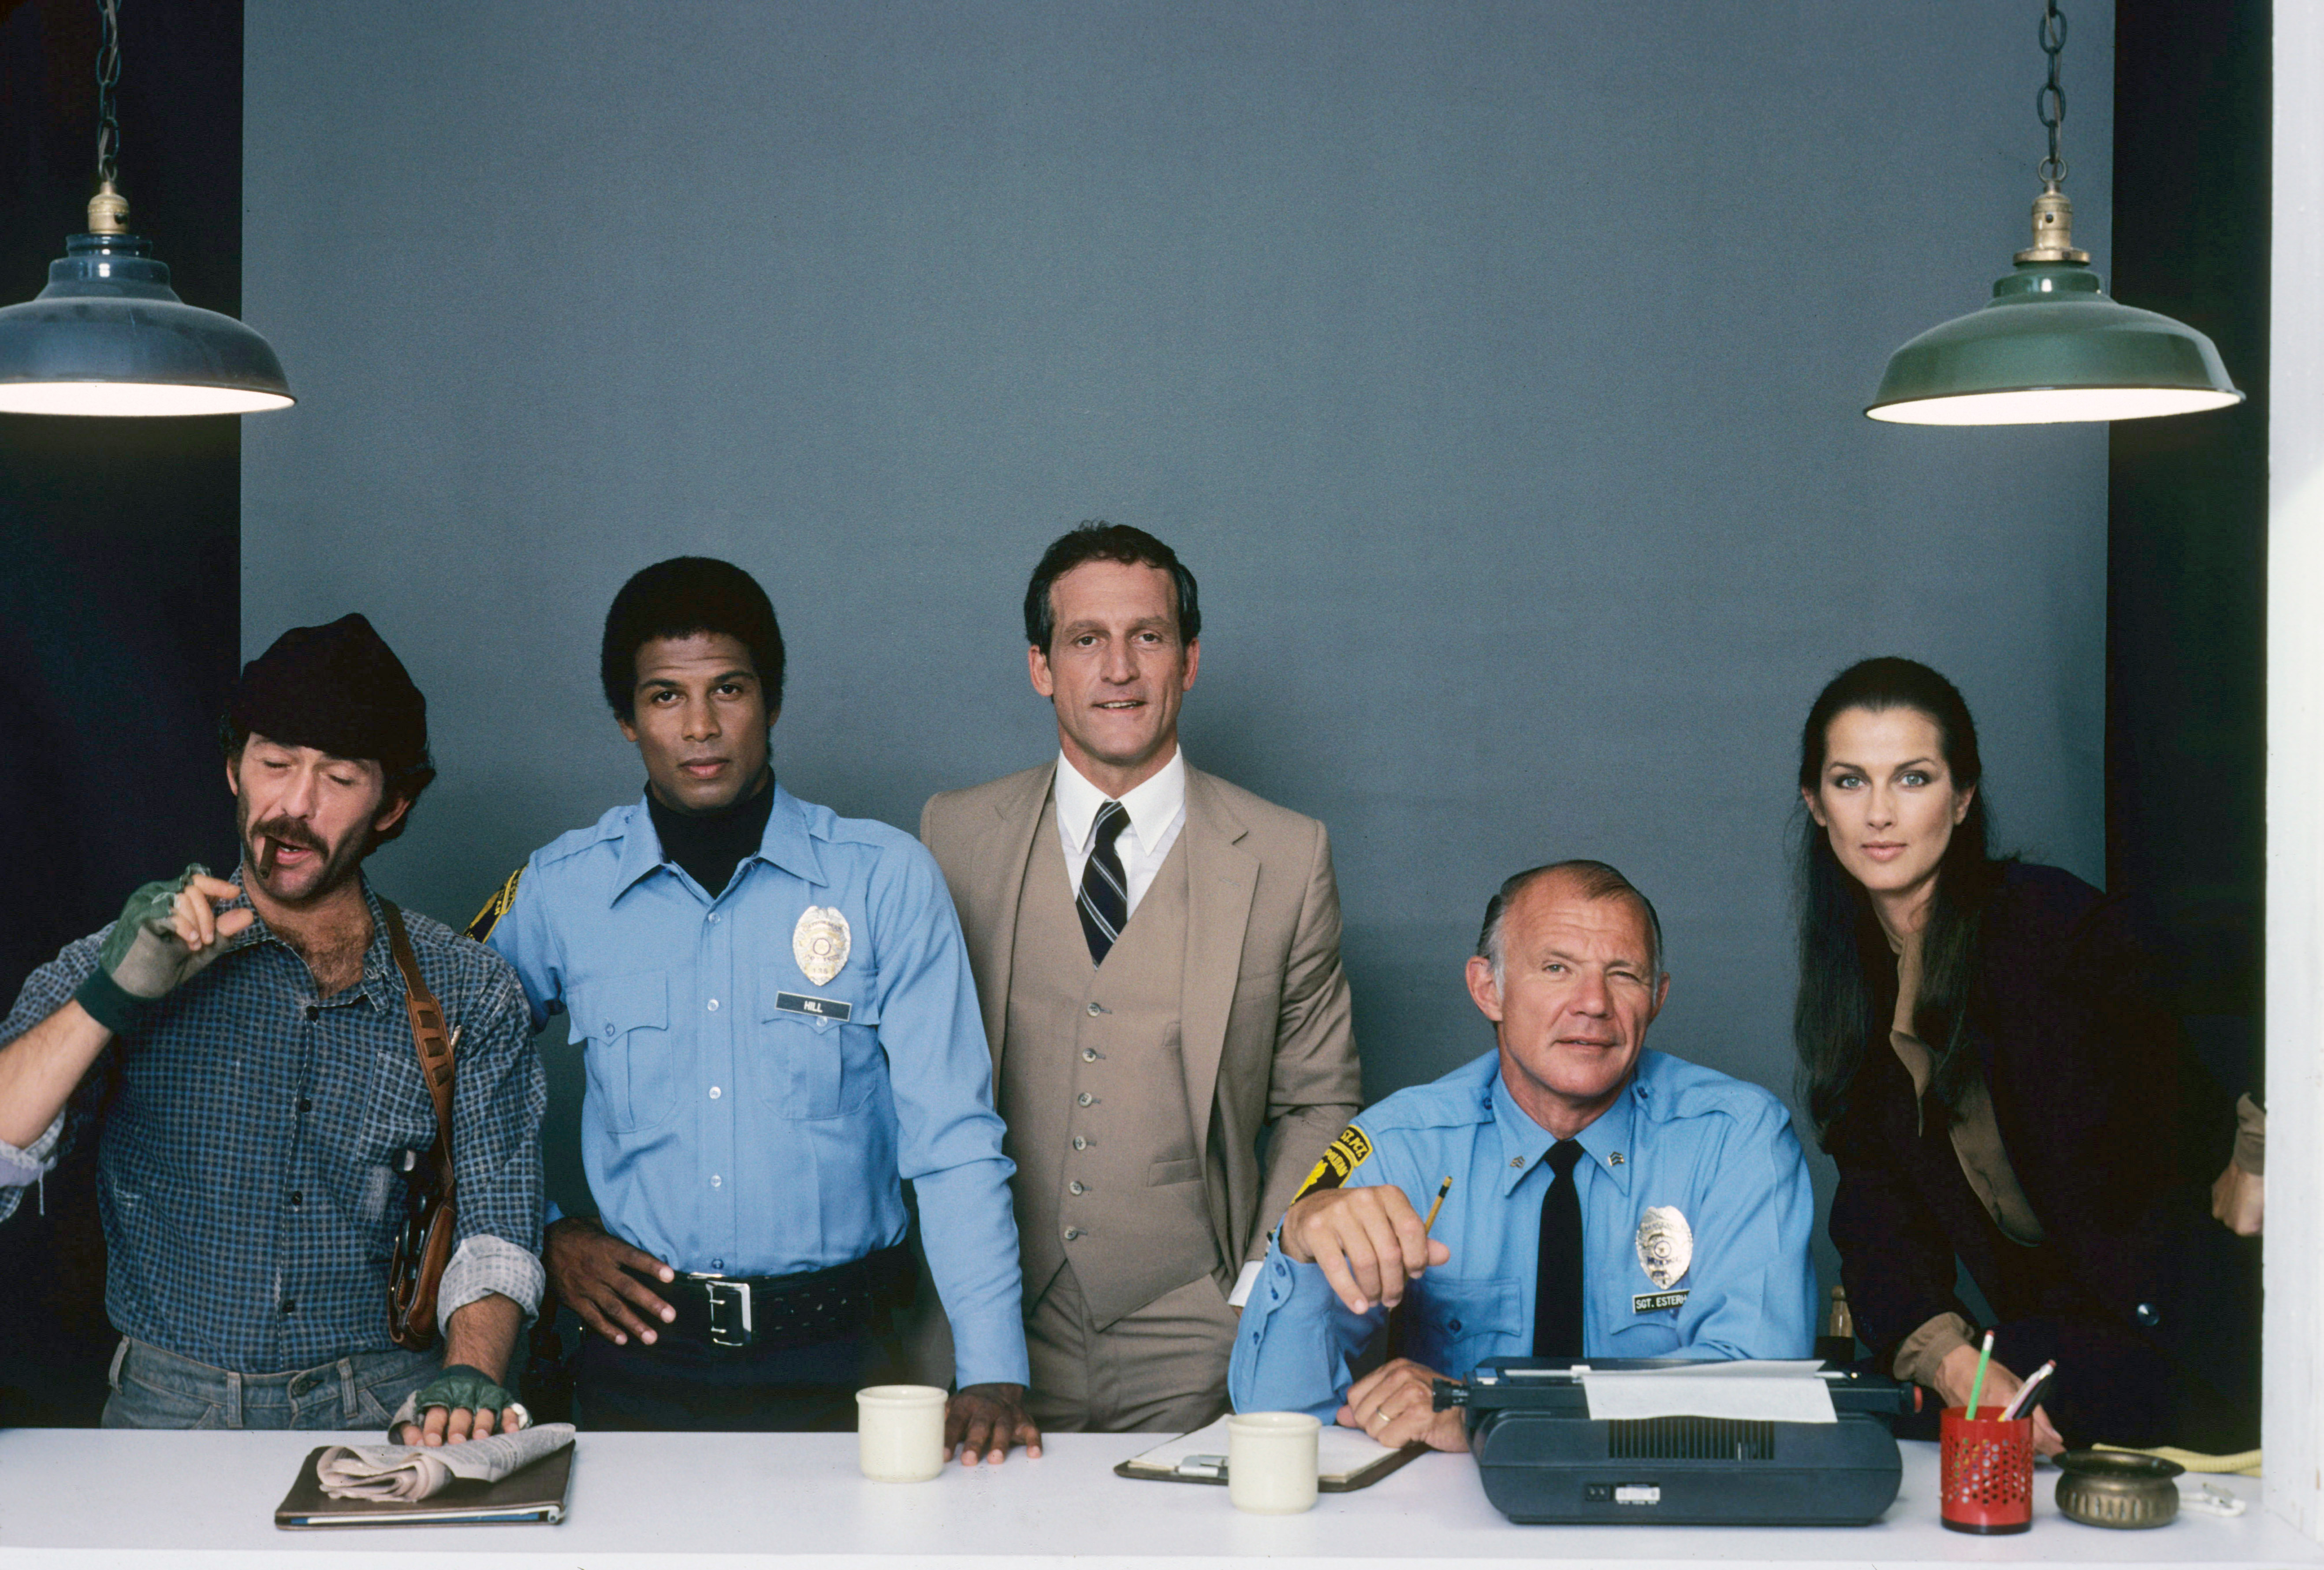 HILL STREET BLUES, from left: Bruce Weitz, Michael Warren, Daniel J. Travanti, Michael Conrad, Veronica Hamel, (Season 1), 1981-87. photo: Robert Phillips/Everett Collection